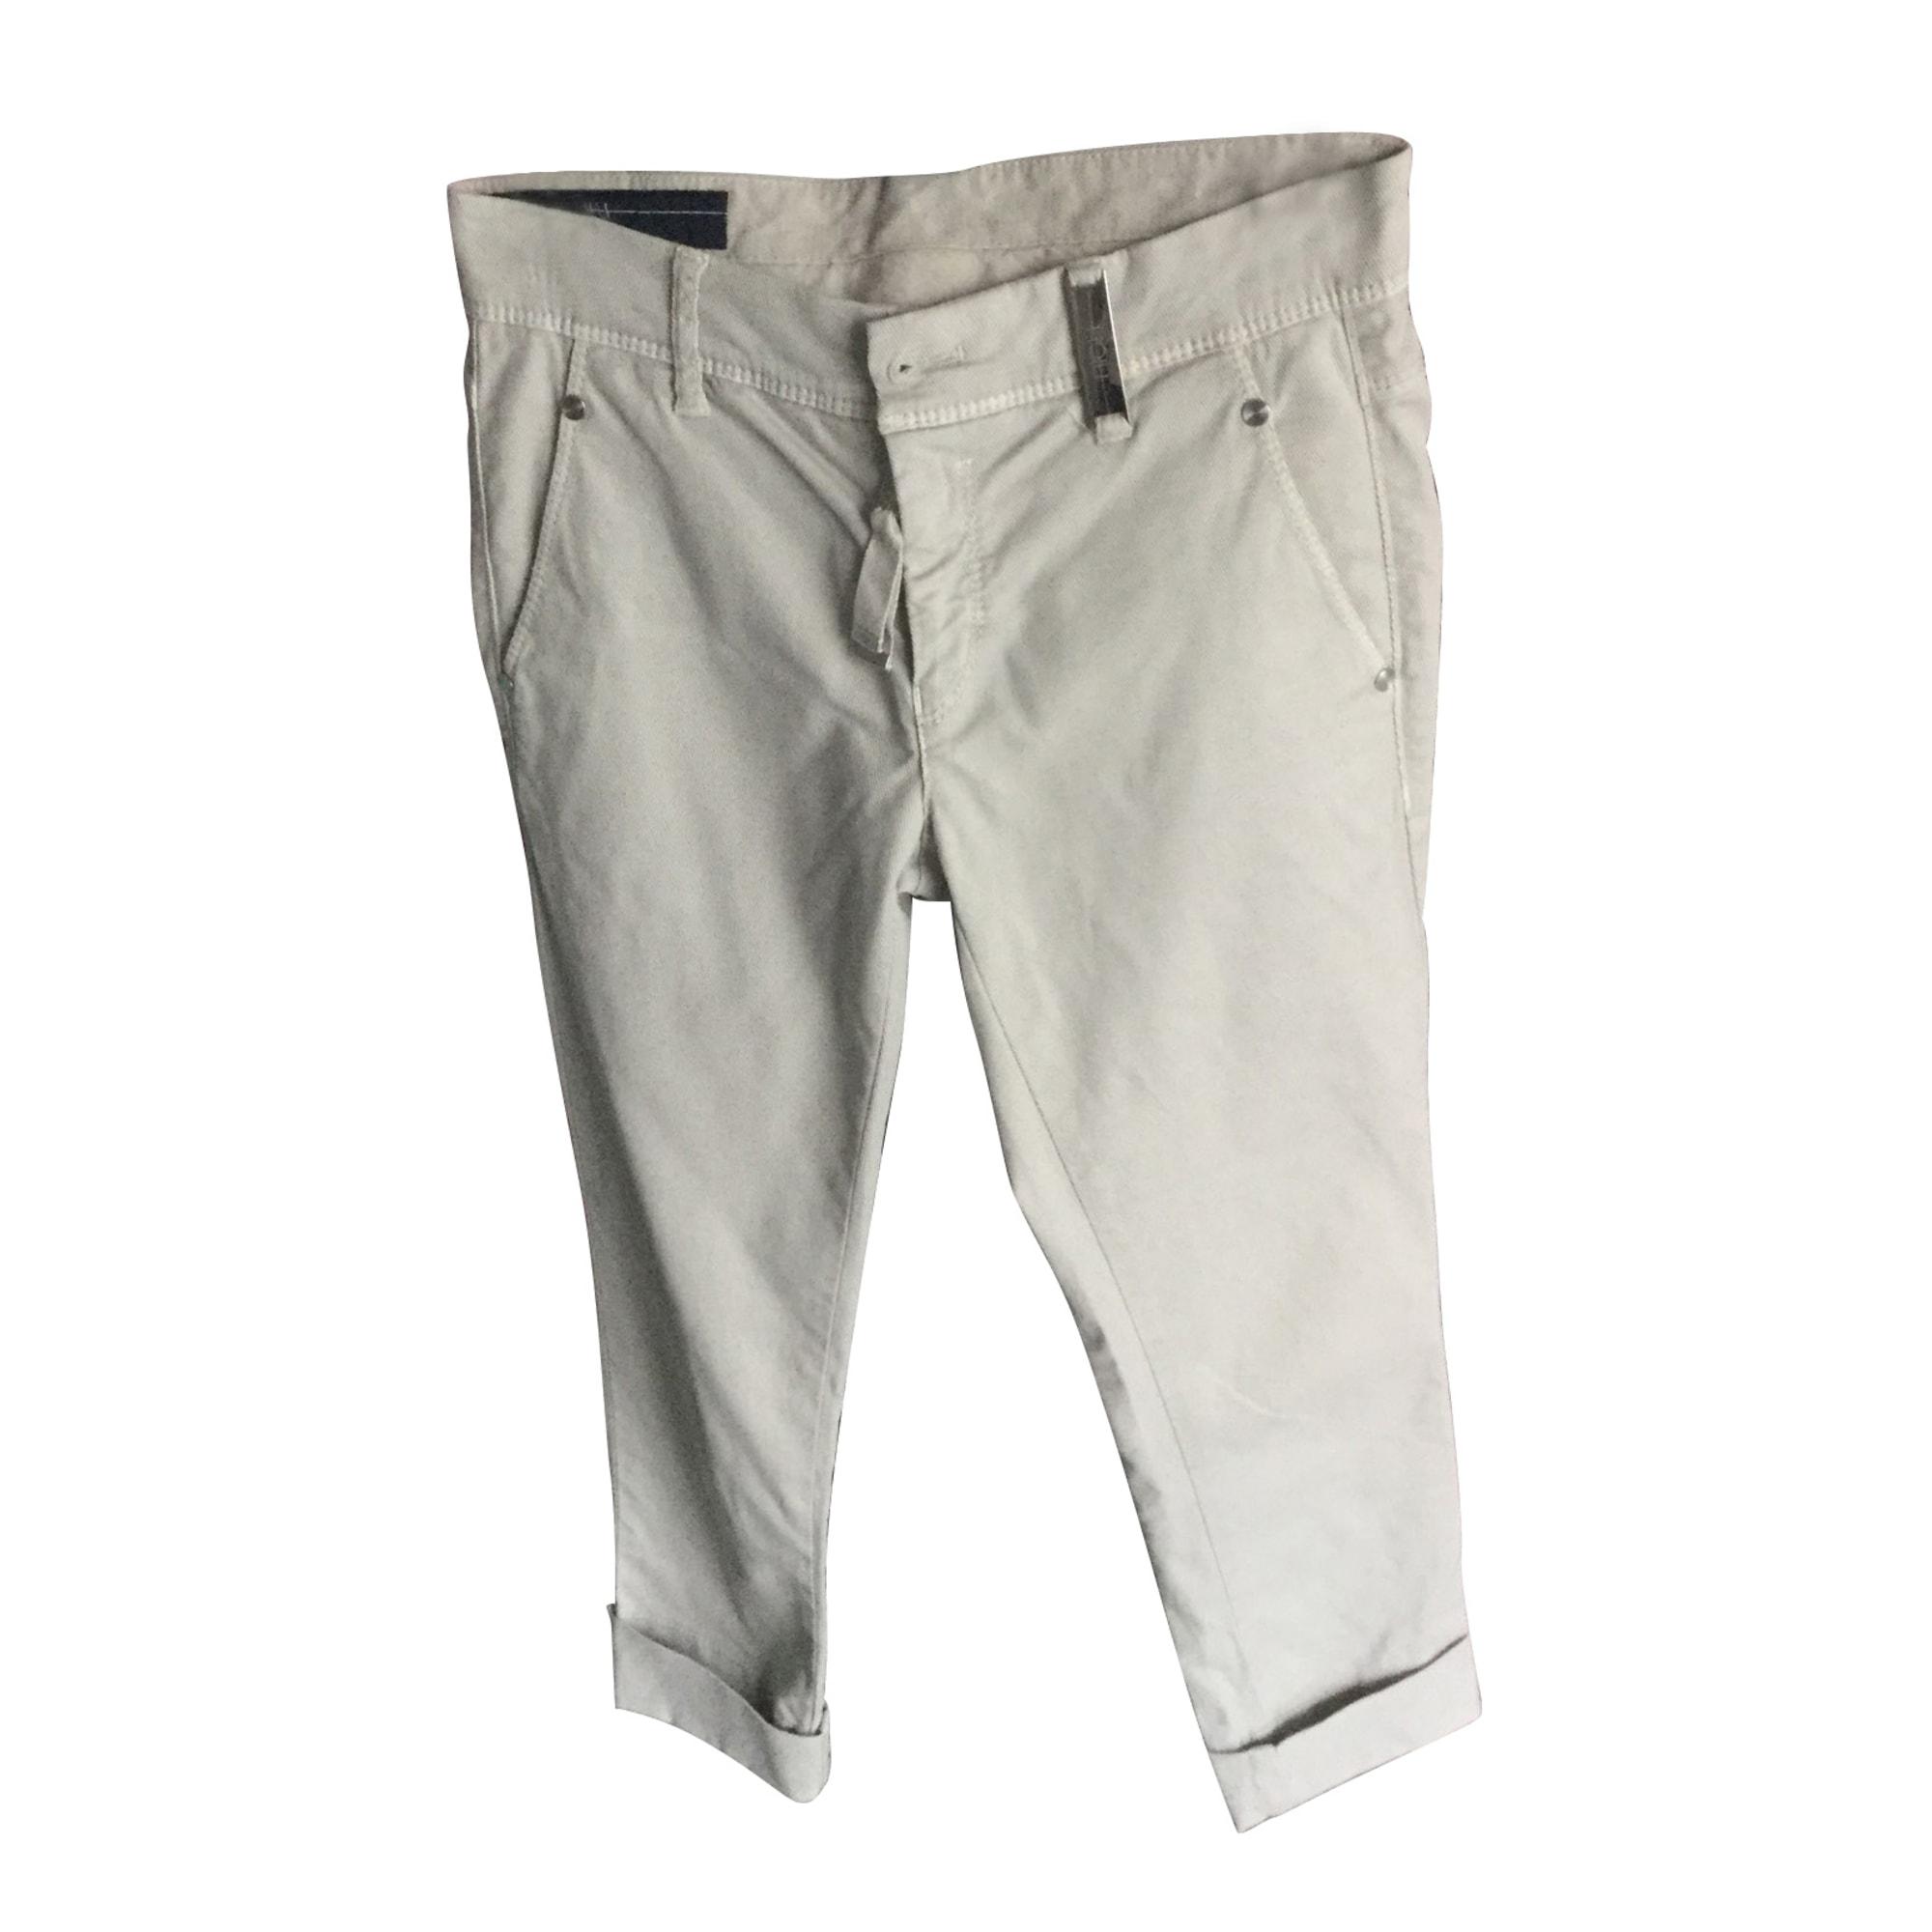 Pantalon slim, cigarette HIGH Blanc, blanc cassé, écru